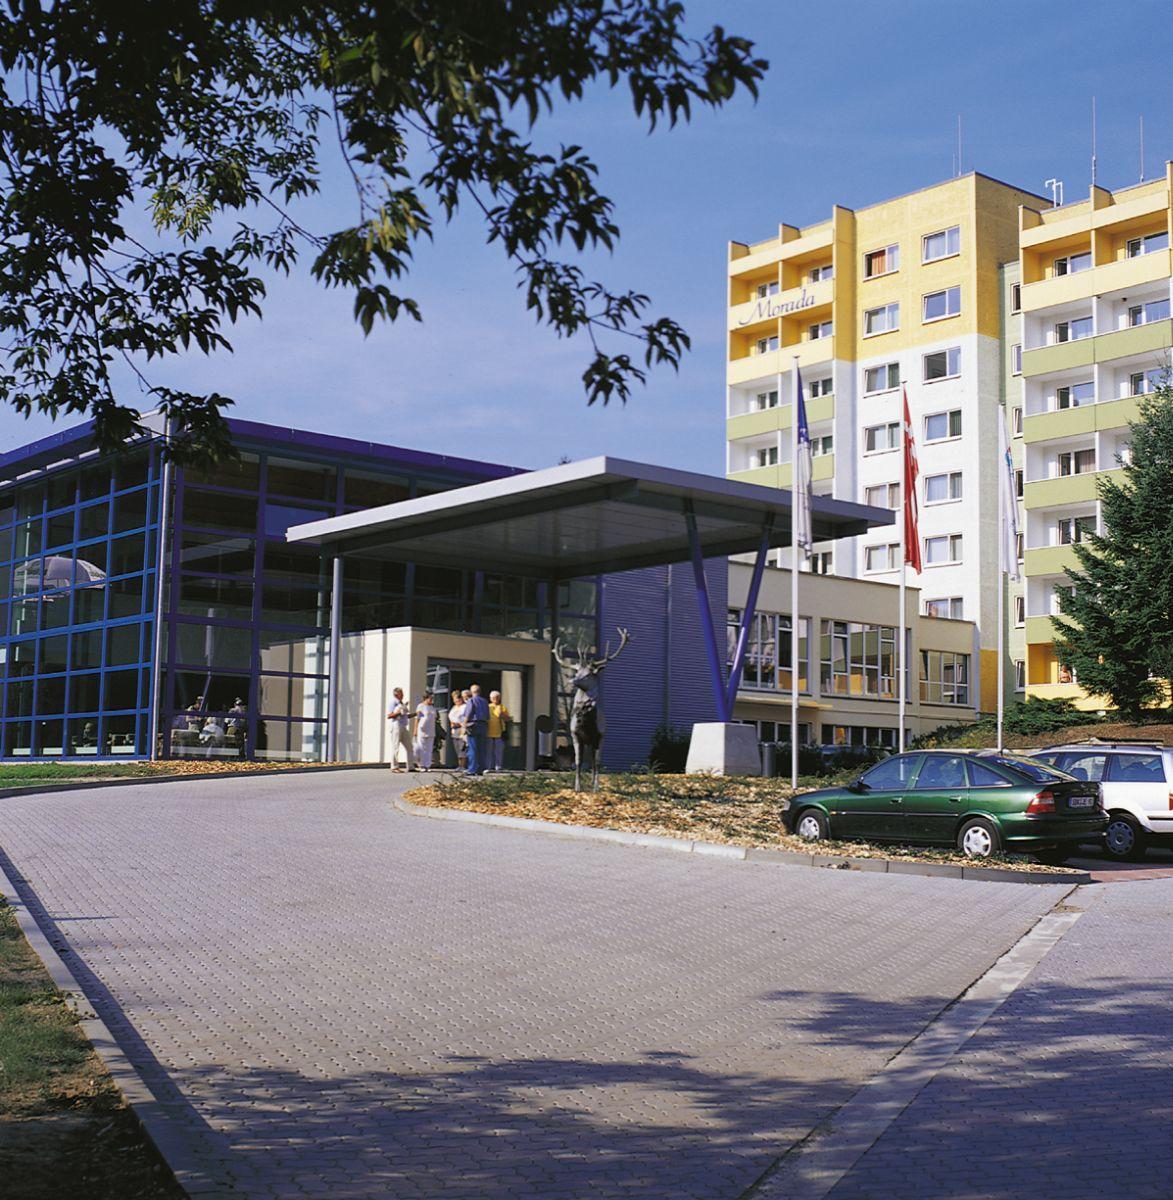 Seniorenreise: 8 Tage MORADA Hotel Alexisbad im Harz